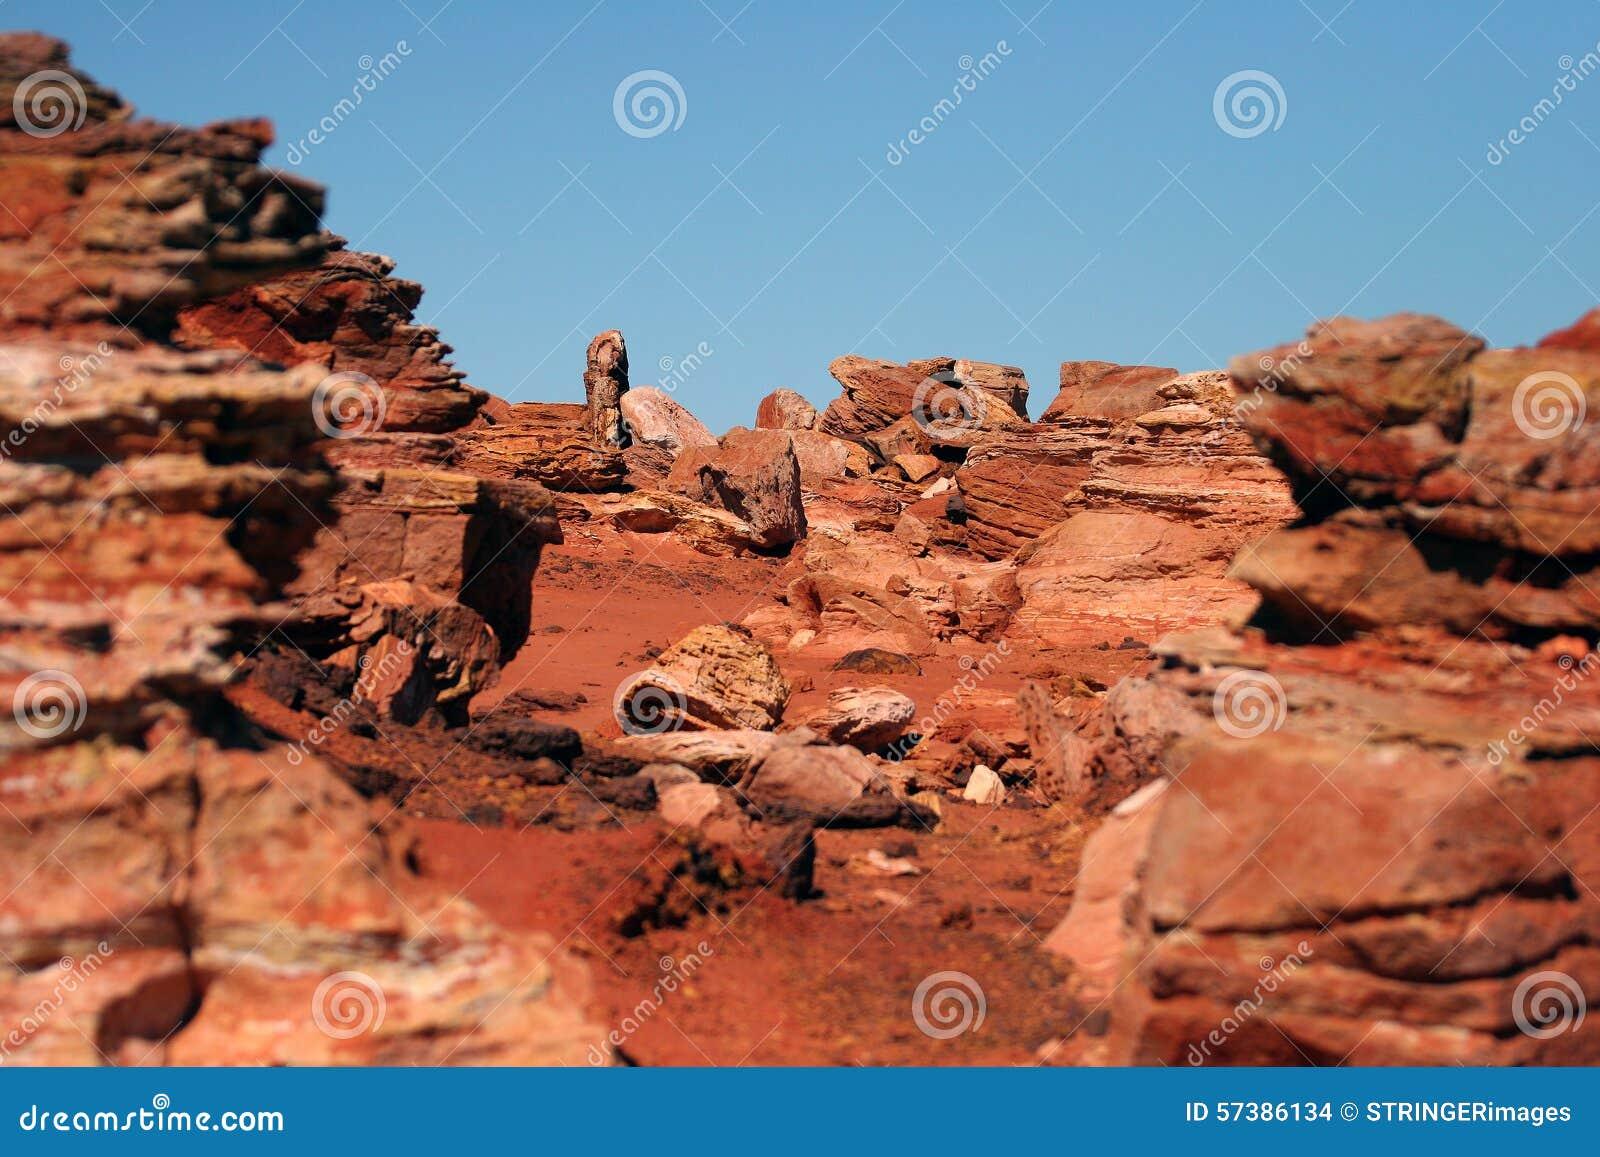 Rode rotsachtige dagzomende aardlaag in Broome